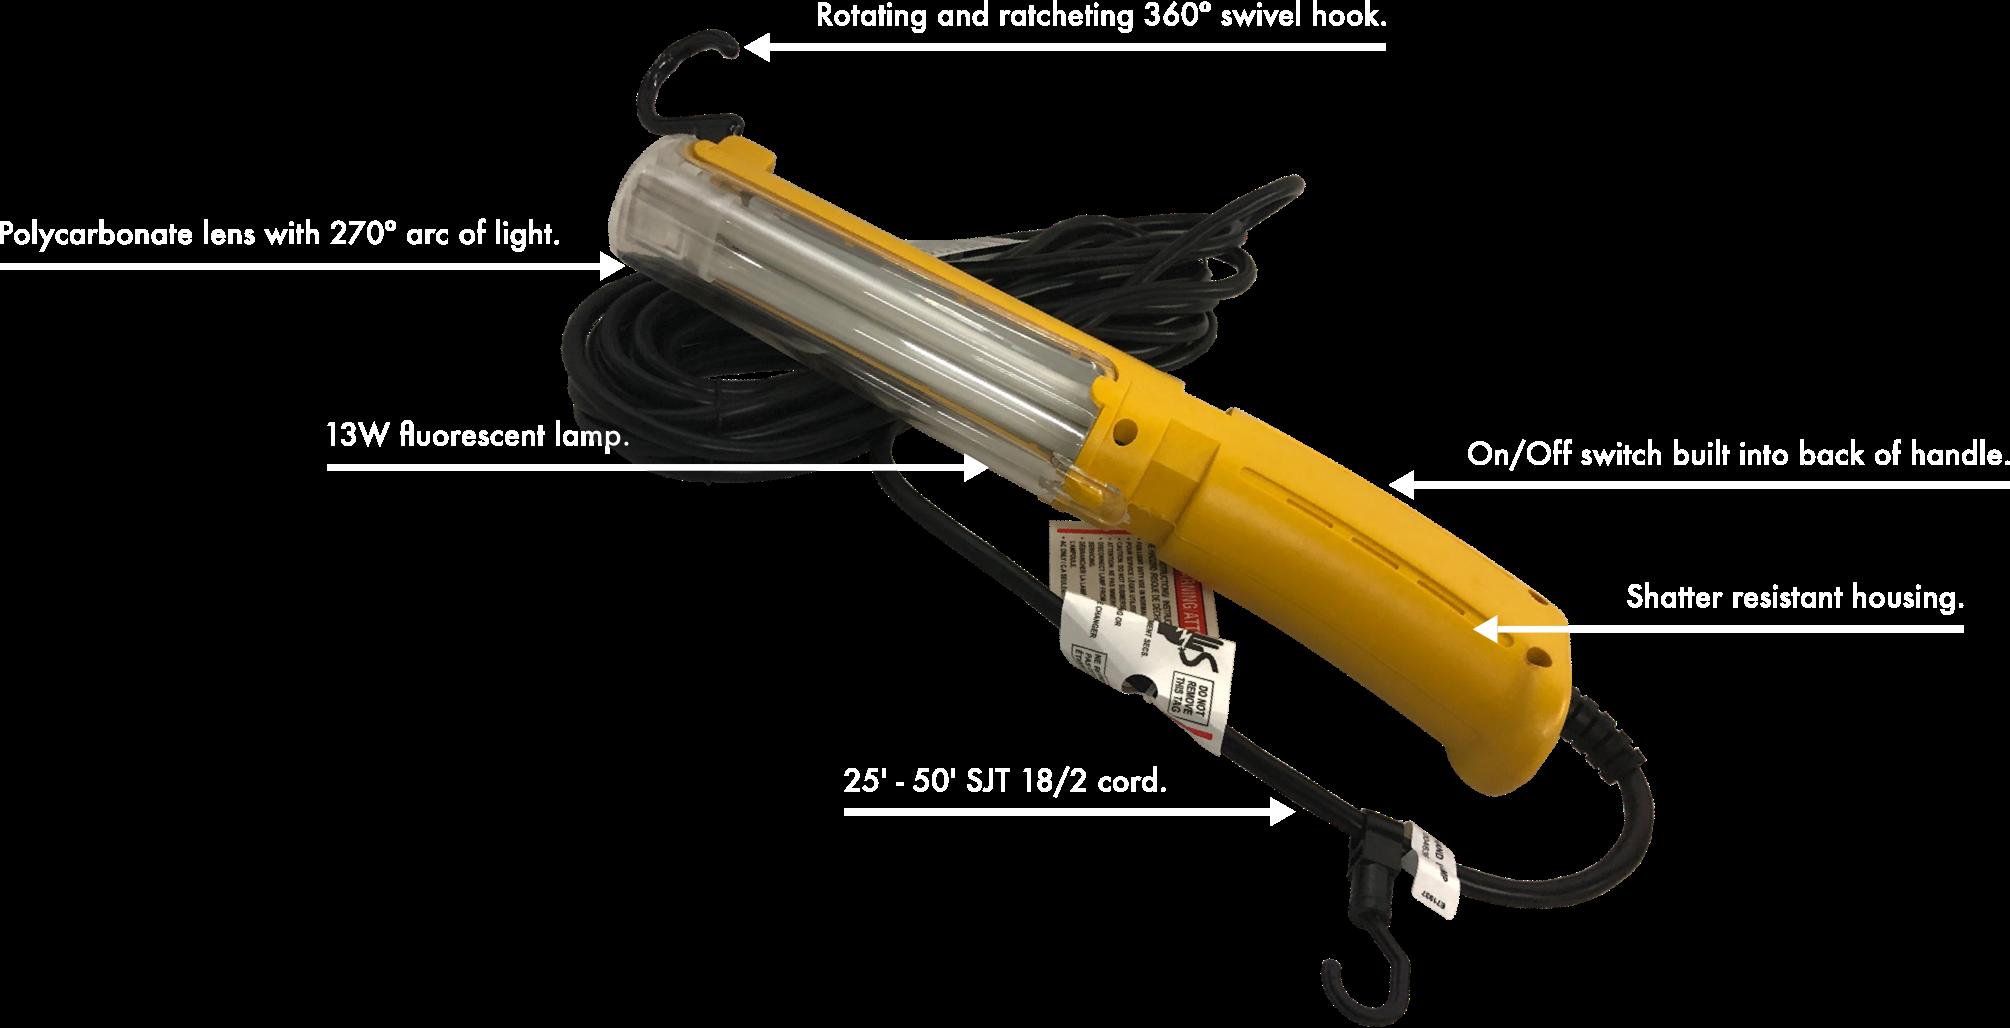 13W Handheld Fluorescent Work Light